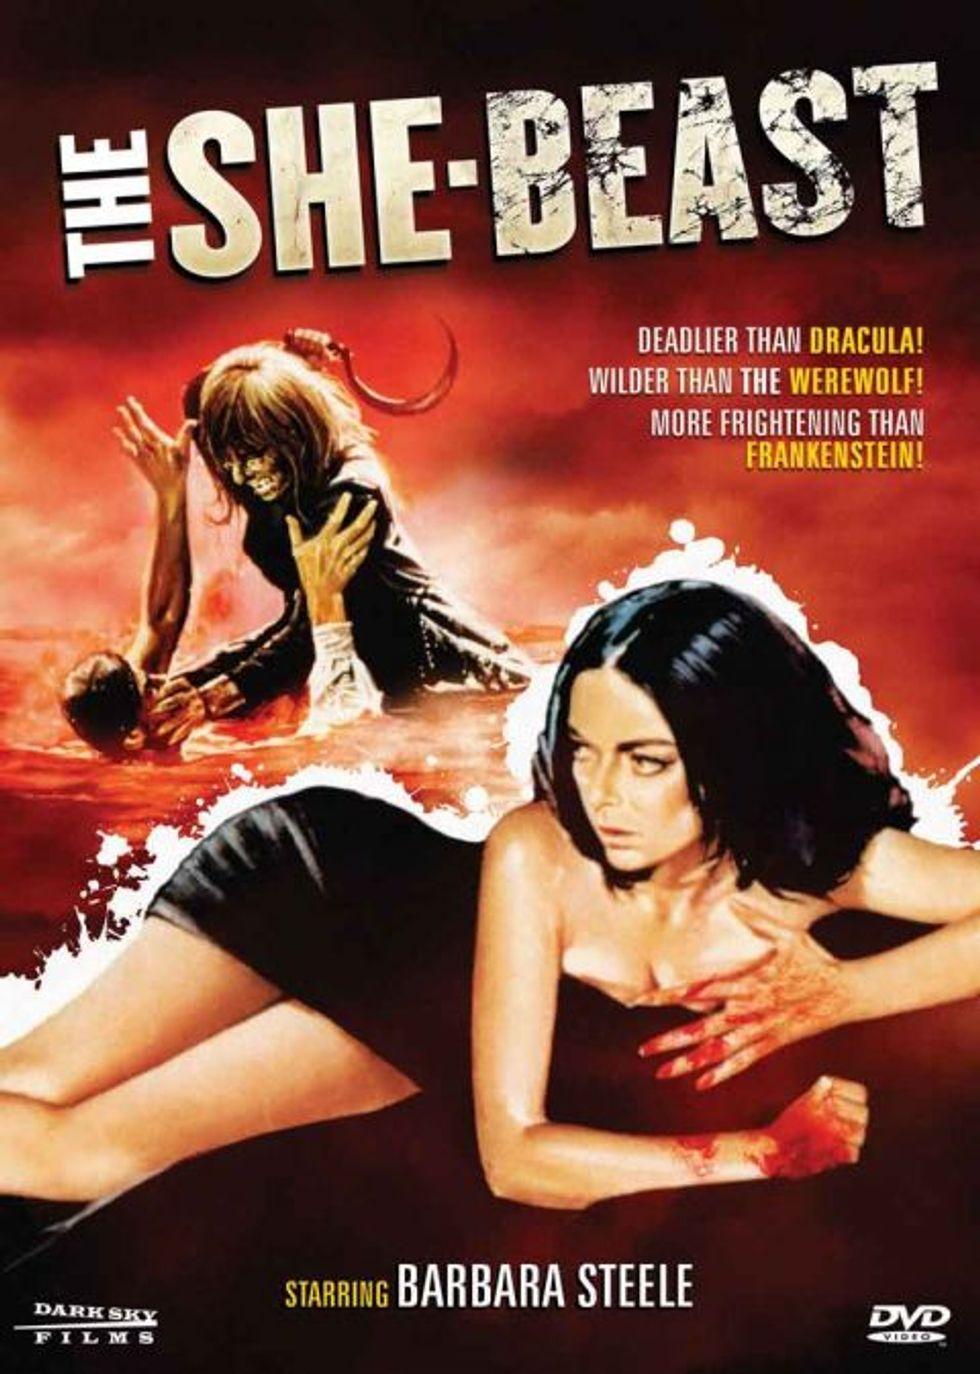 The She-Beast On DVD!